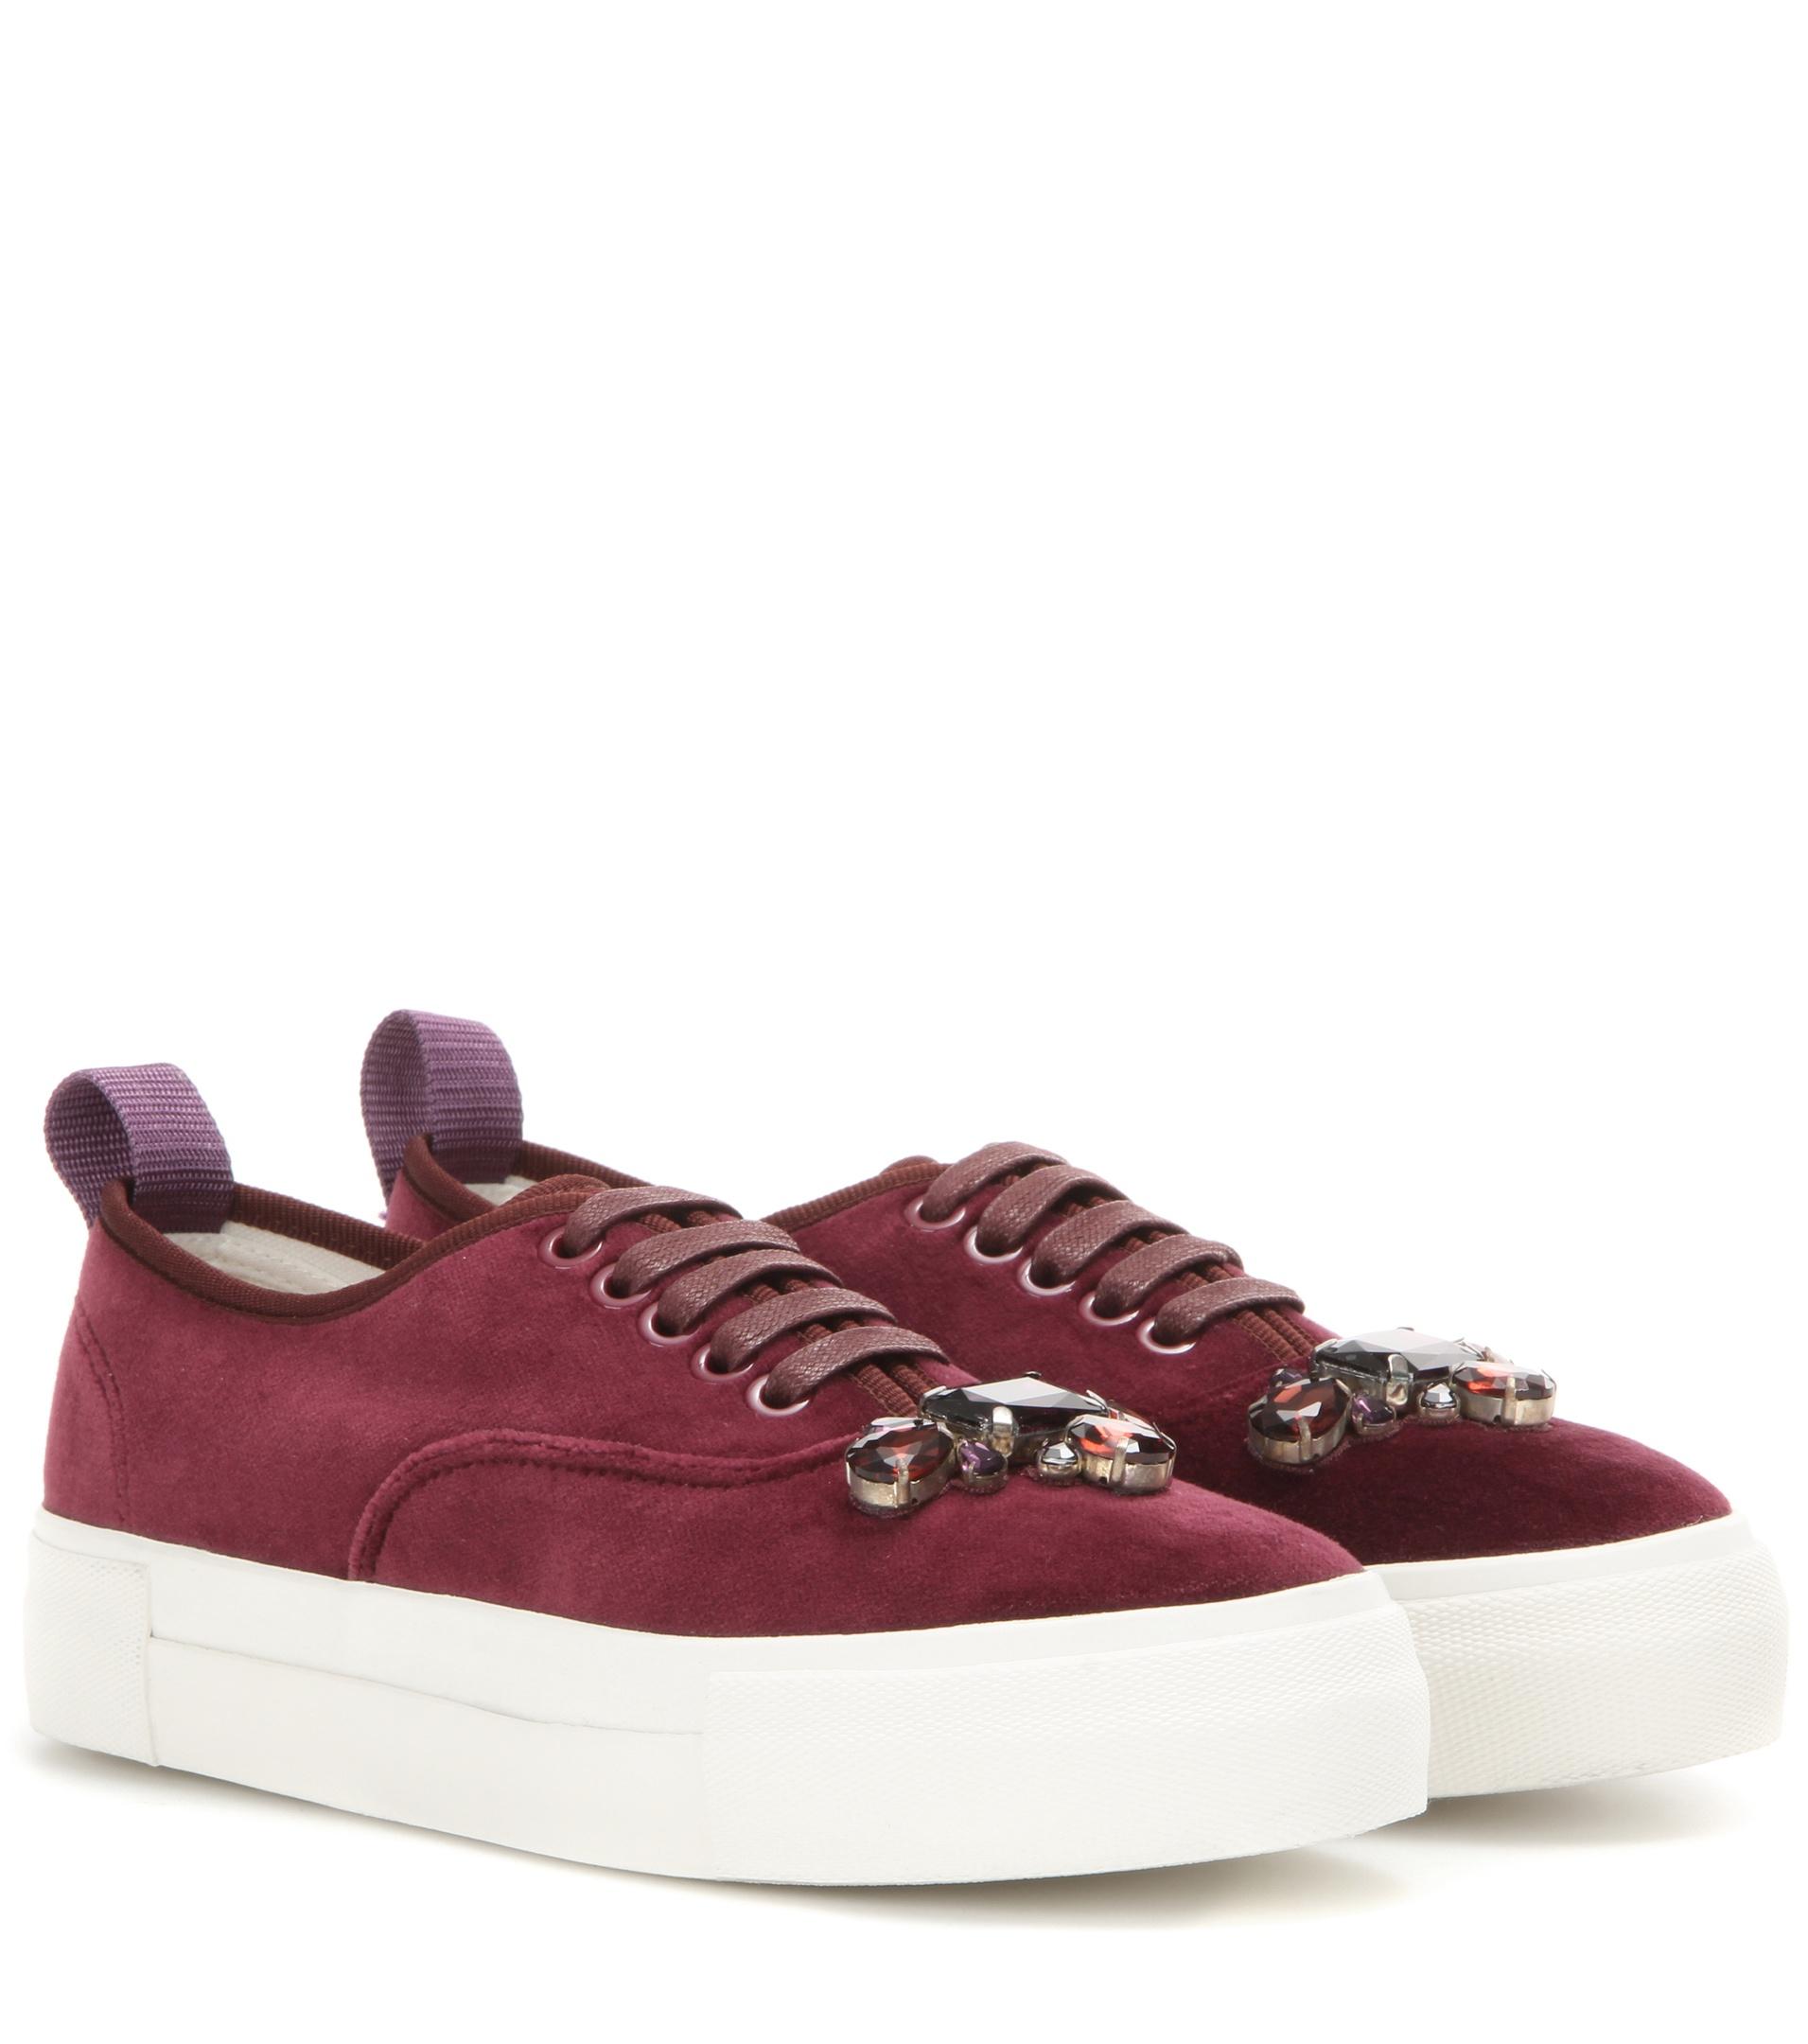 Carolina Herrera Shoes Sales